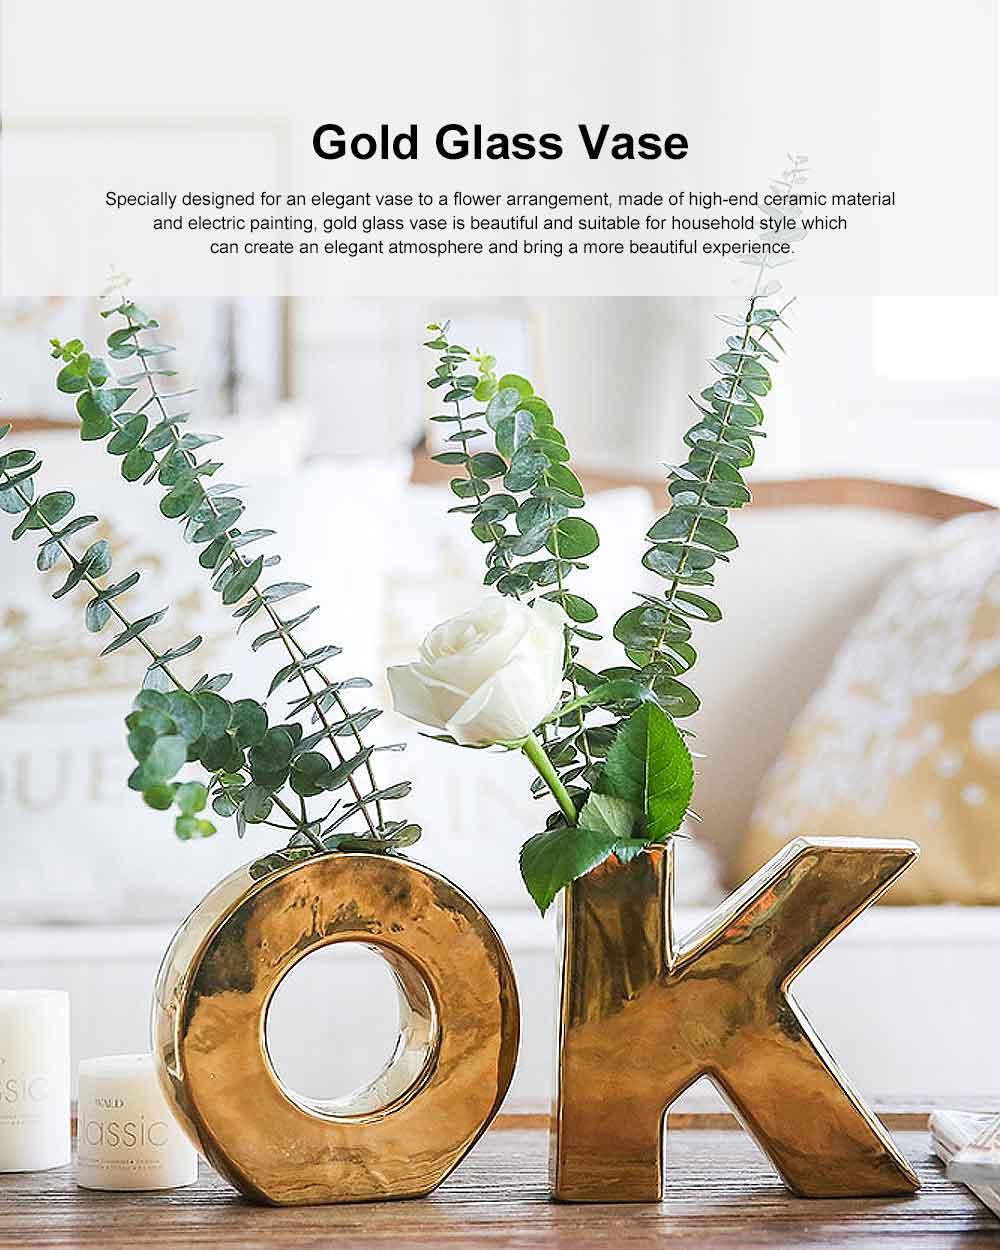 Gold Ceramic Vase with OK Shape & Non-slip Bottom, Electric Paint Spraying Vase 0